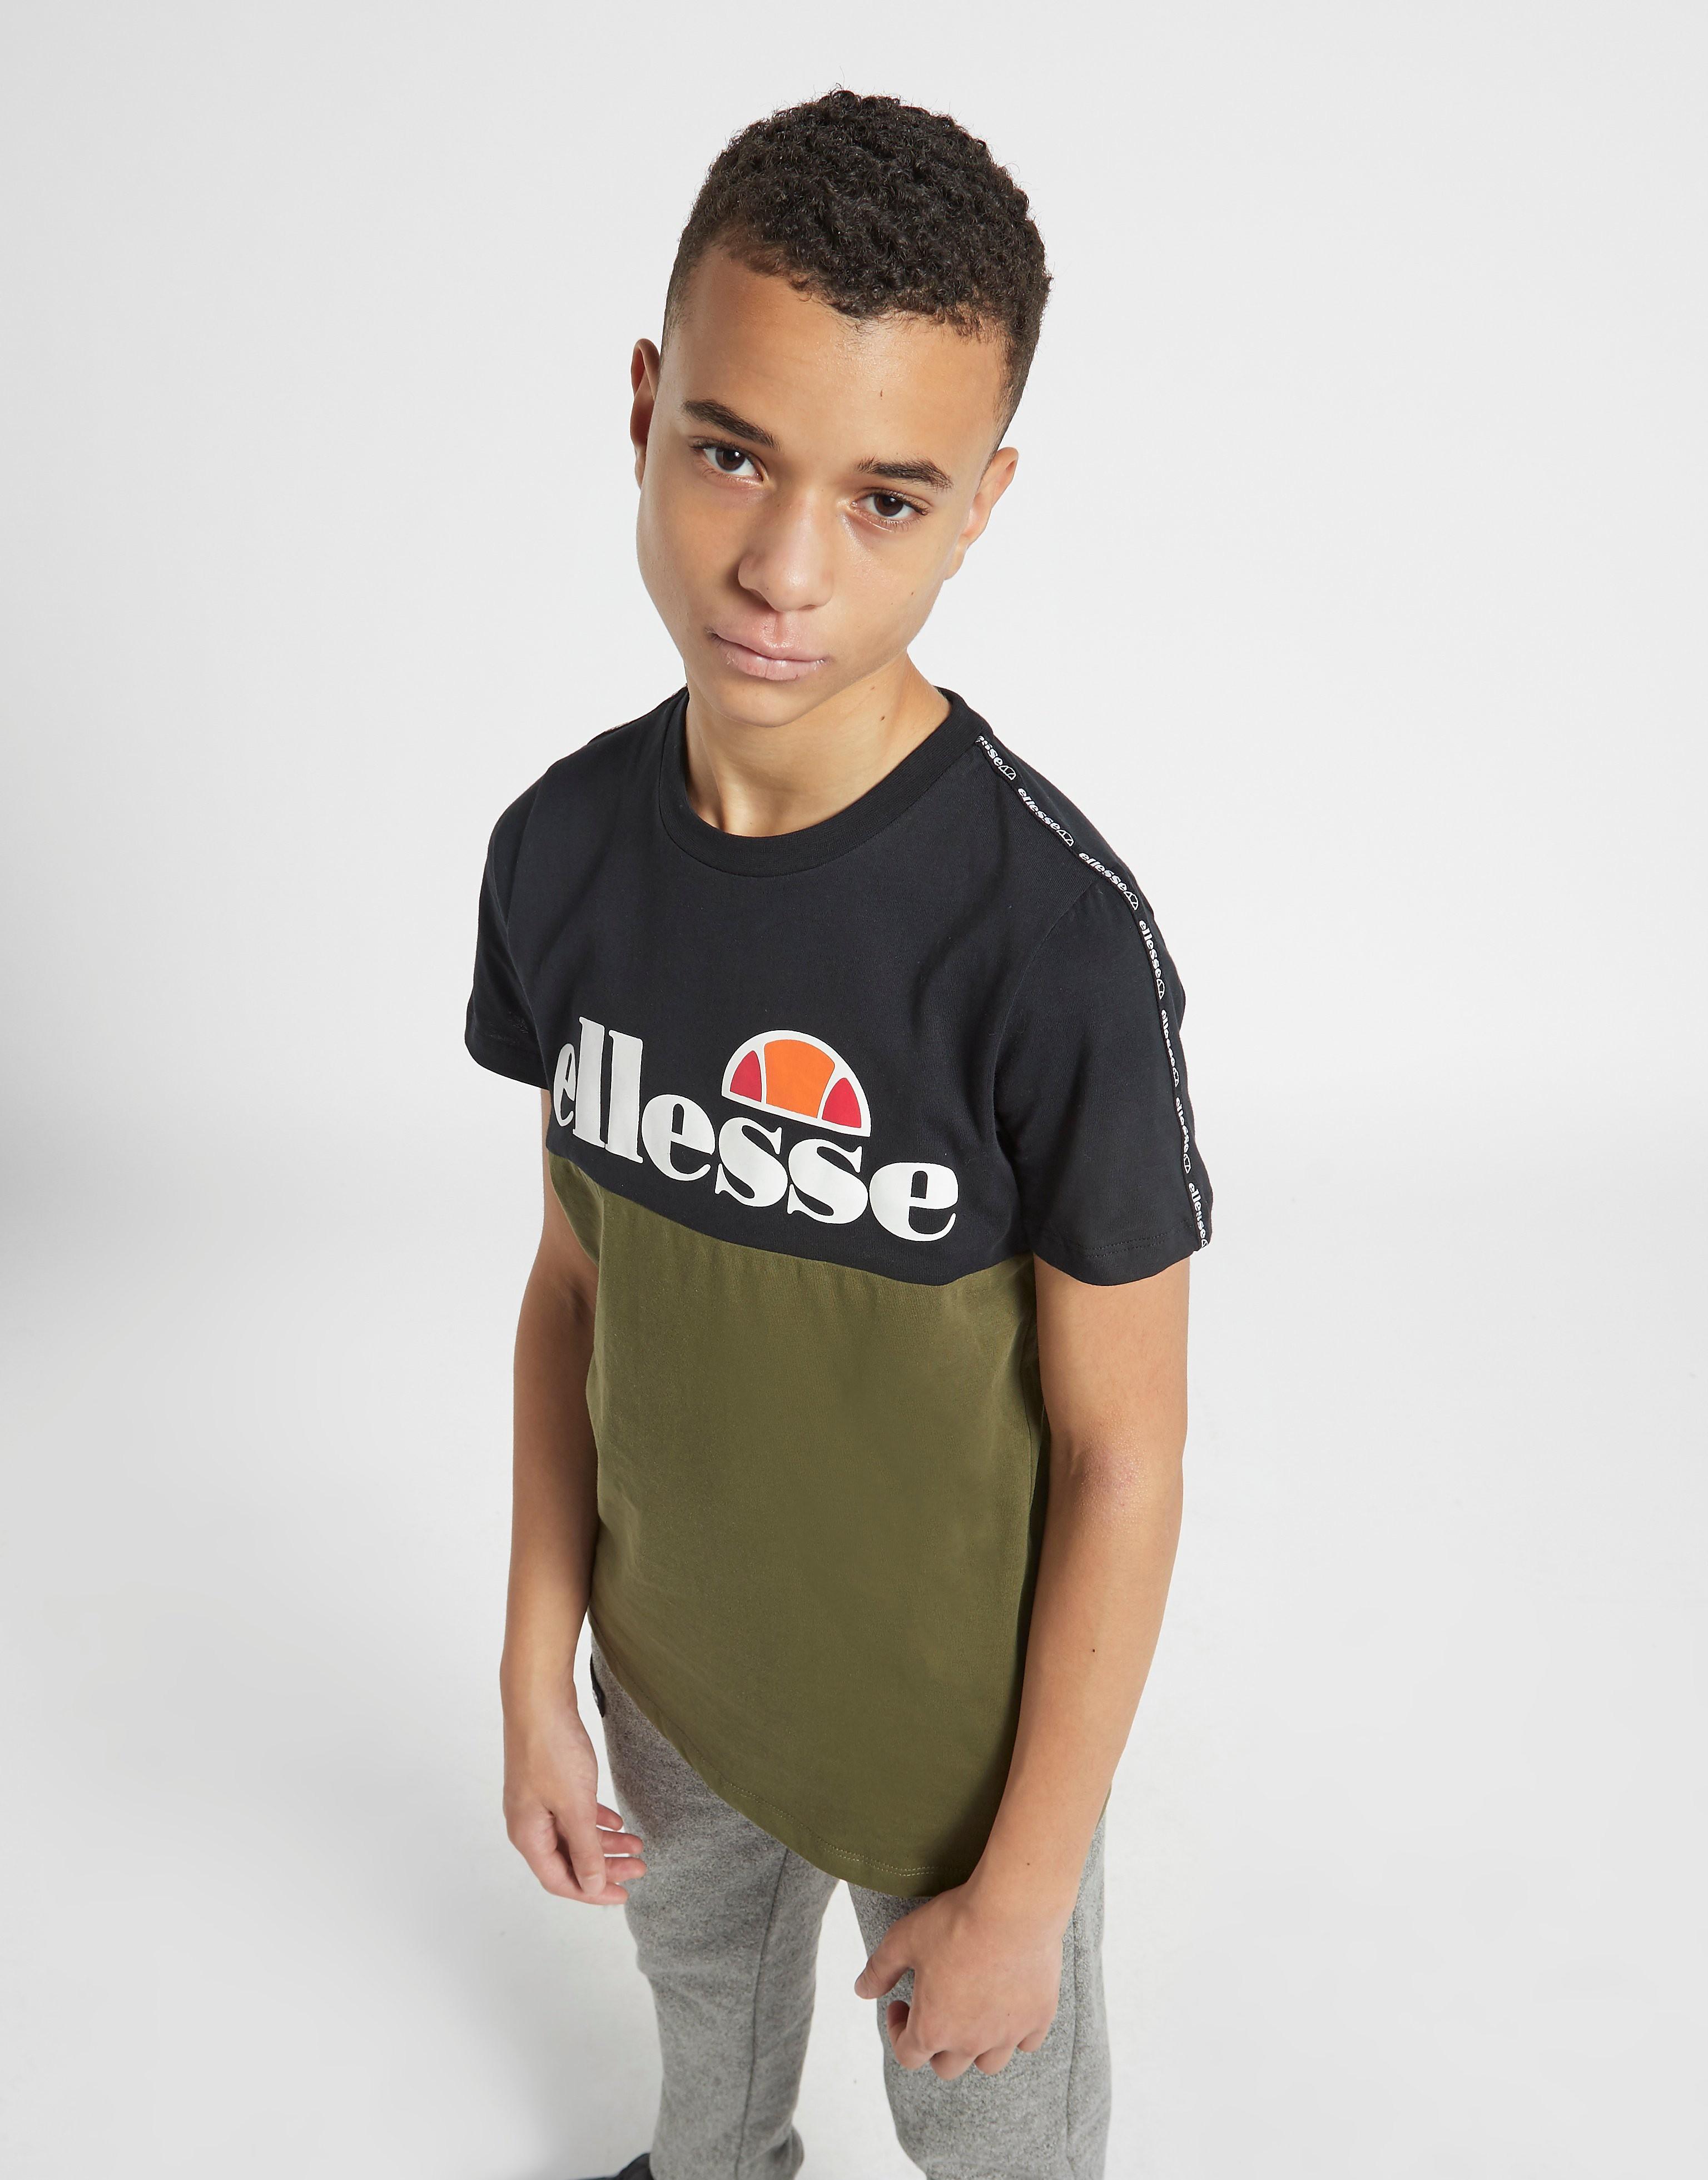 Ellesse Bonesio Colour Block T-Shirt Junior Khaki/Black Kind